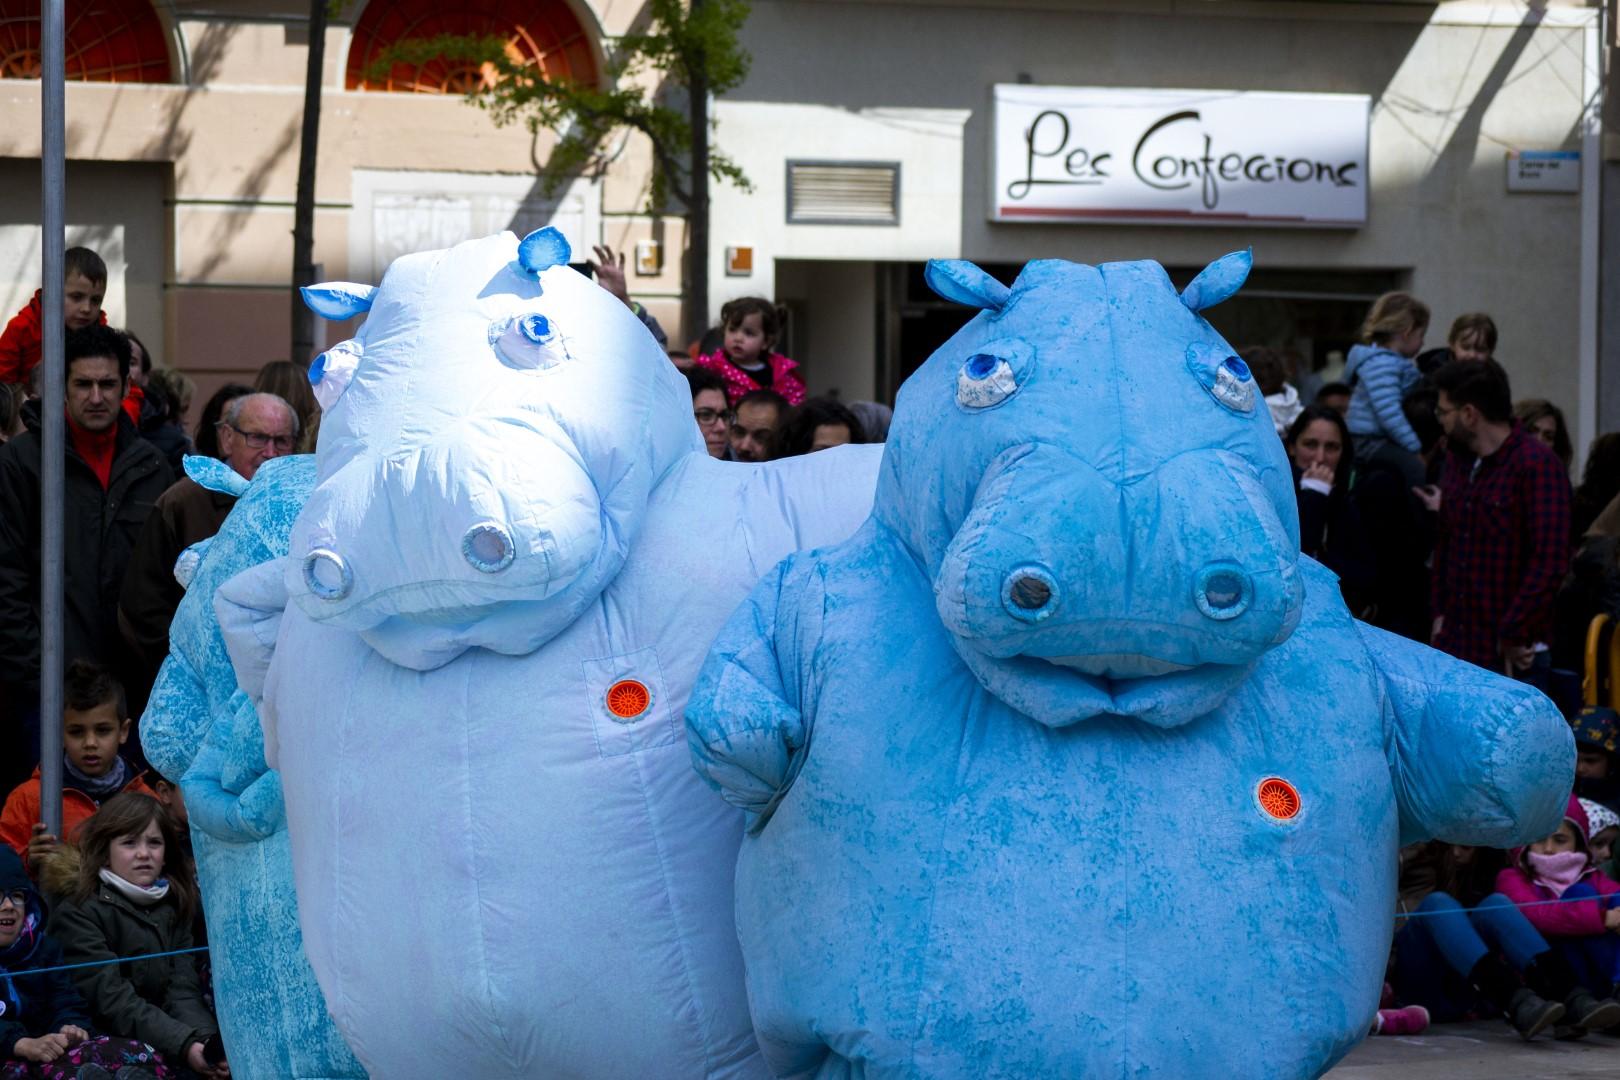 Hippos Mostra Igualada - Públic Familiar